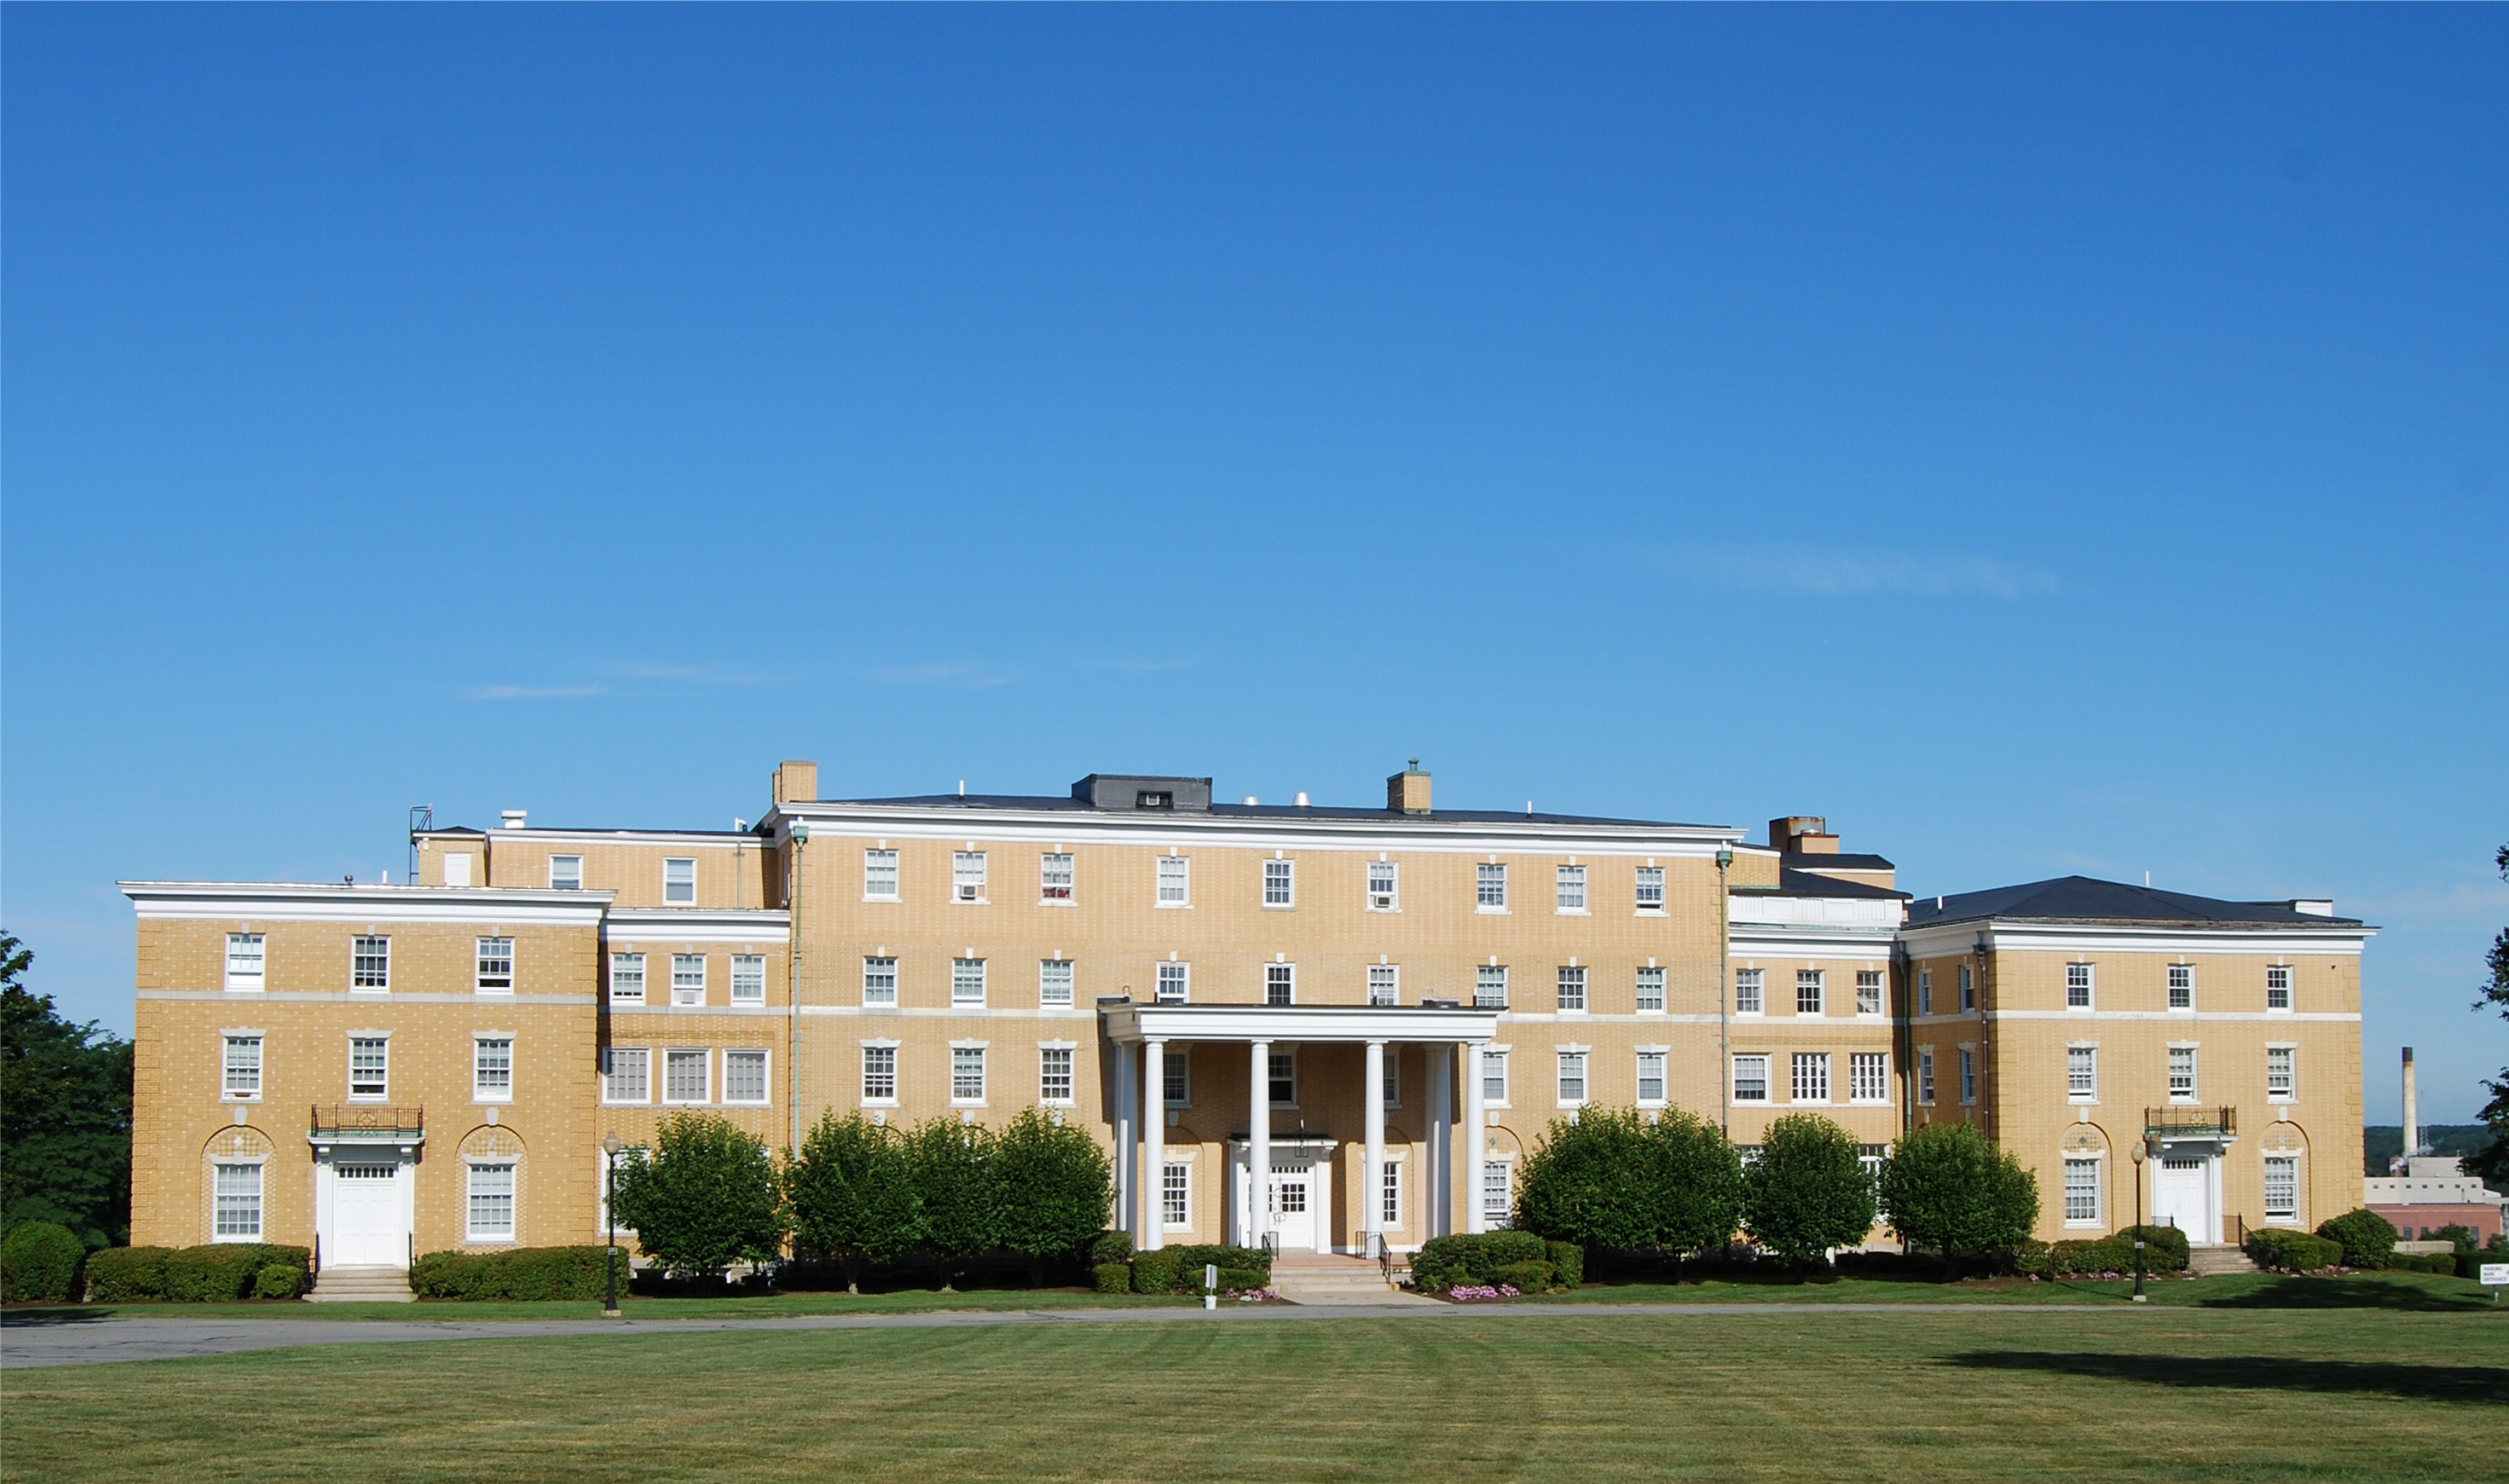 Truesdale Hospital - Wikipedia